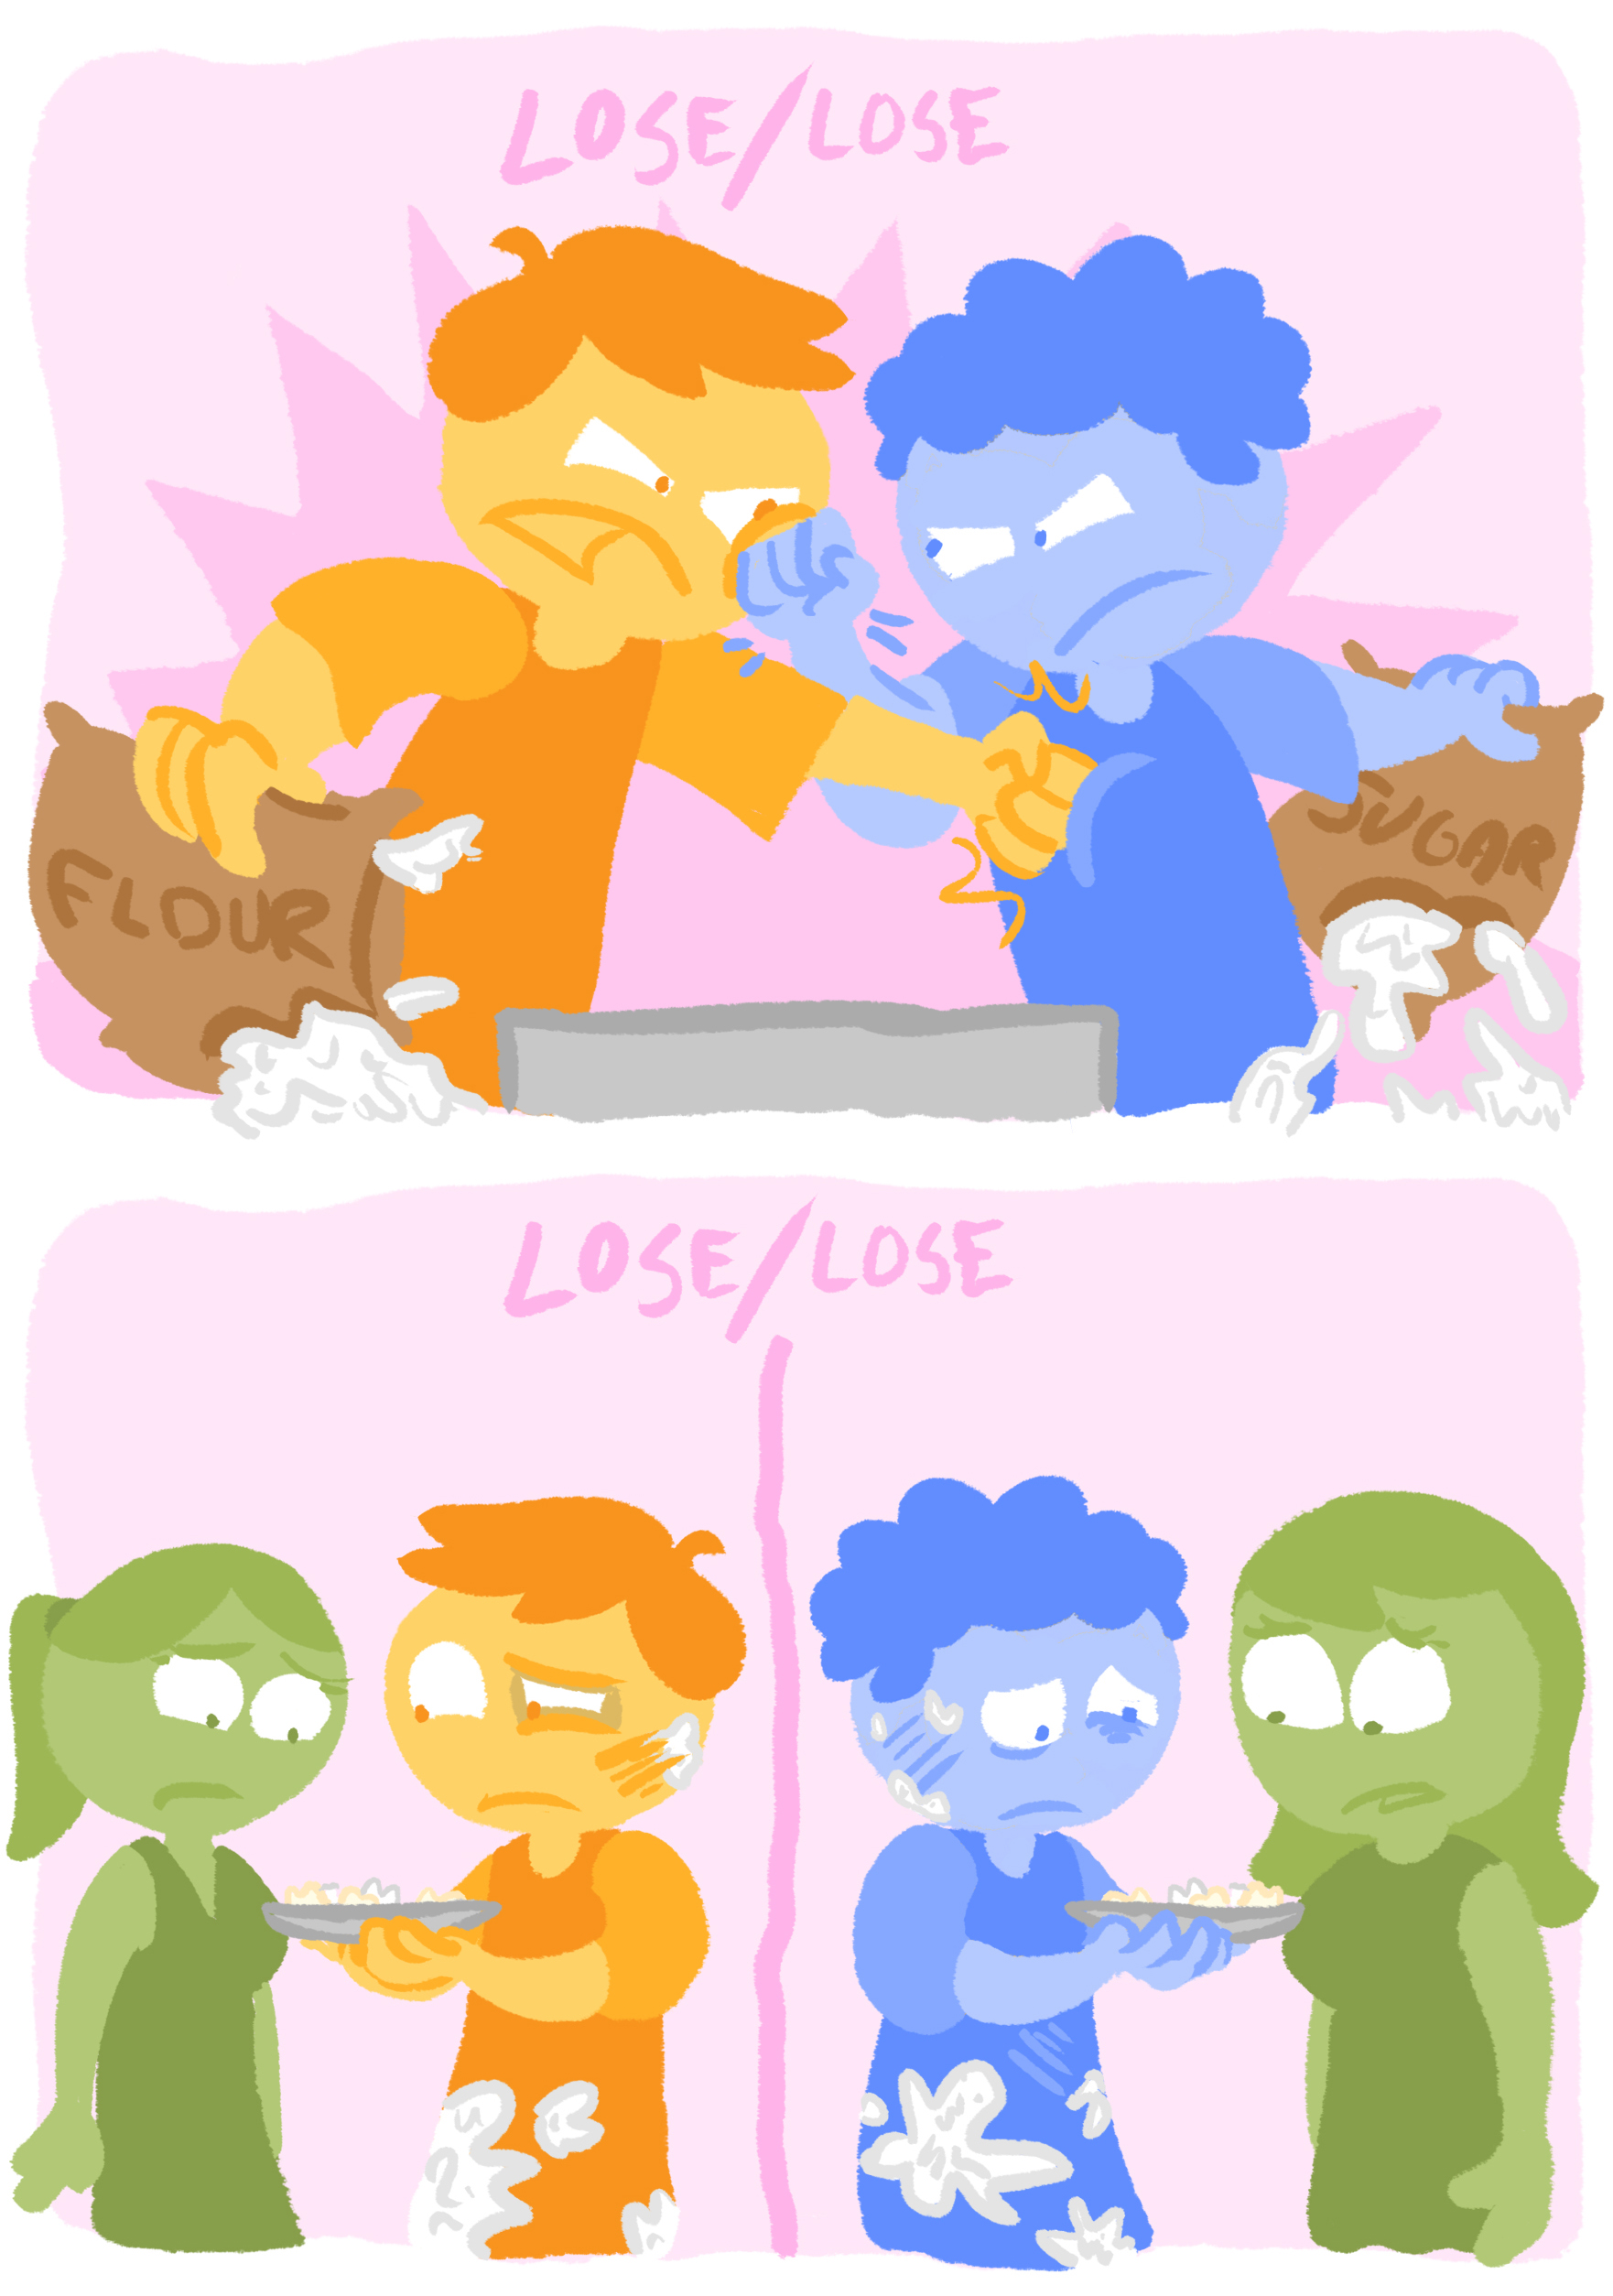 Lose-Lose.jpg